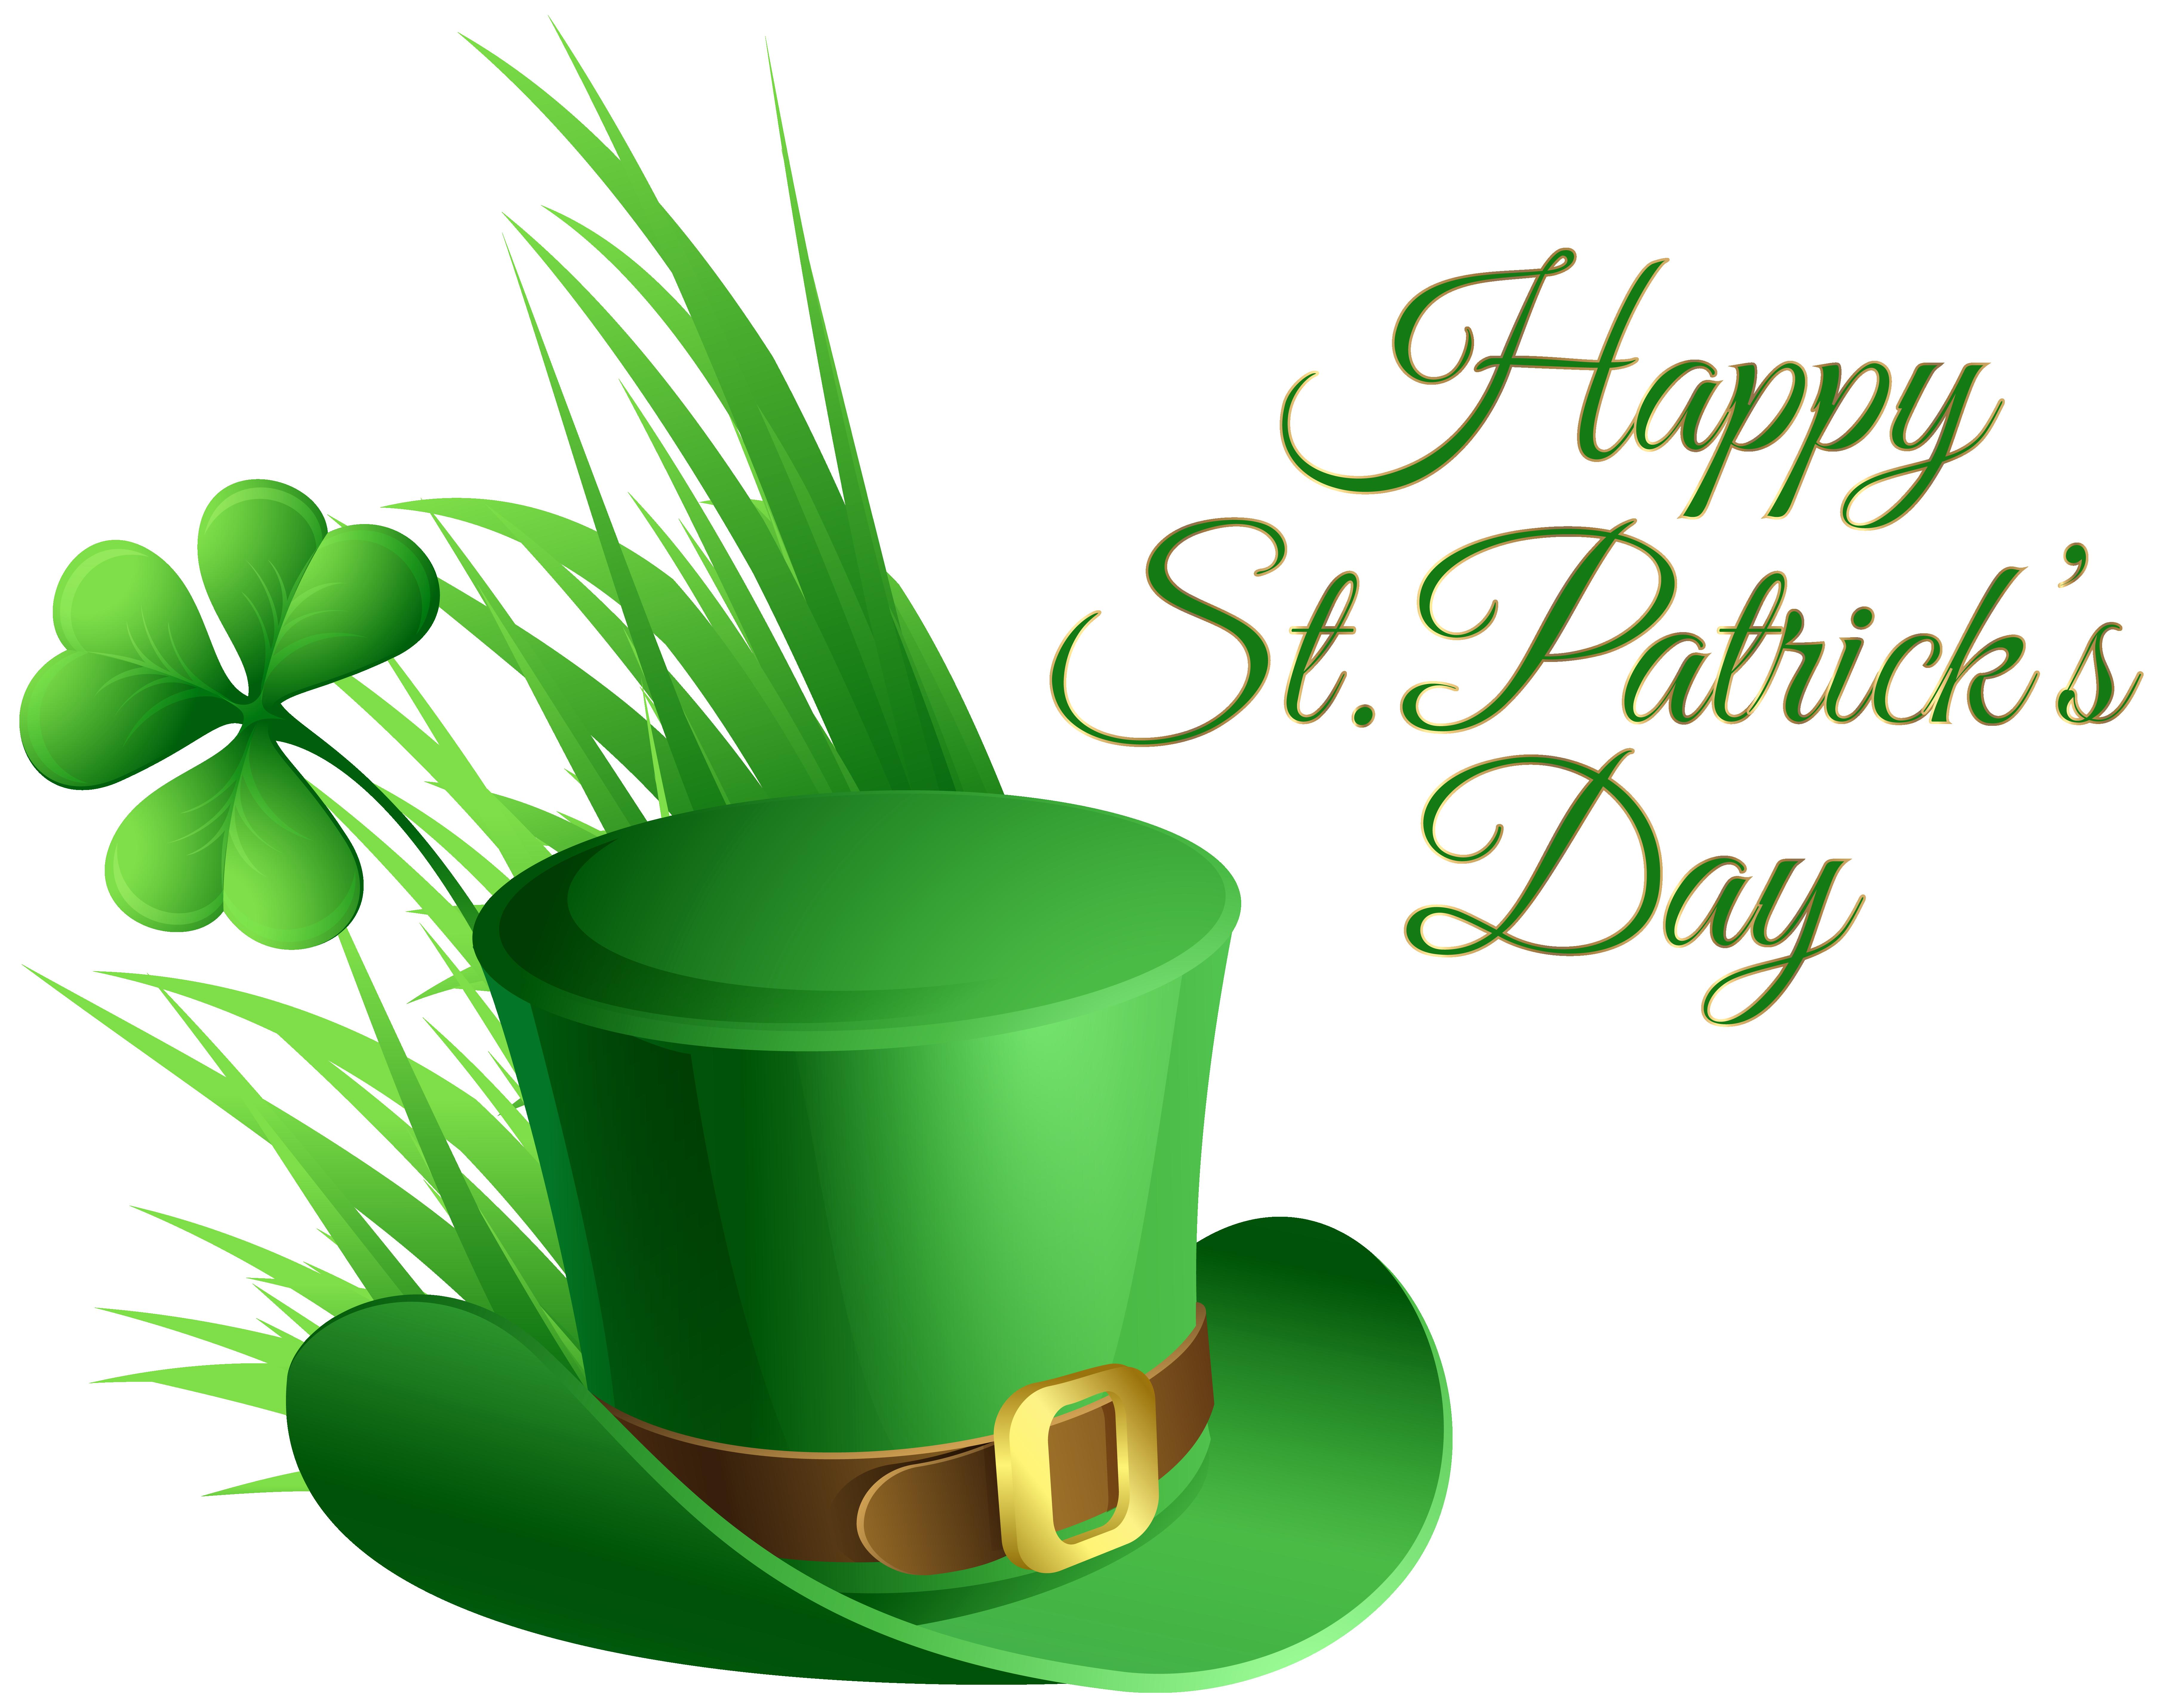 7246x5723 St Patricks Day Hat And Shamrock Transparent Png Clip Art Image